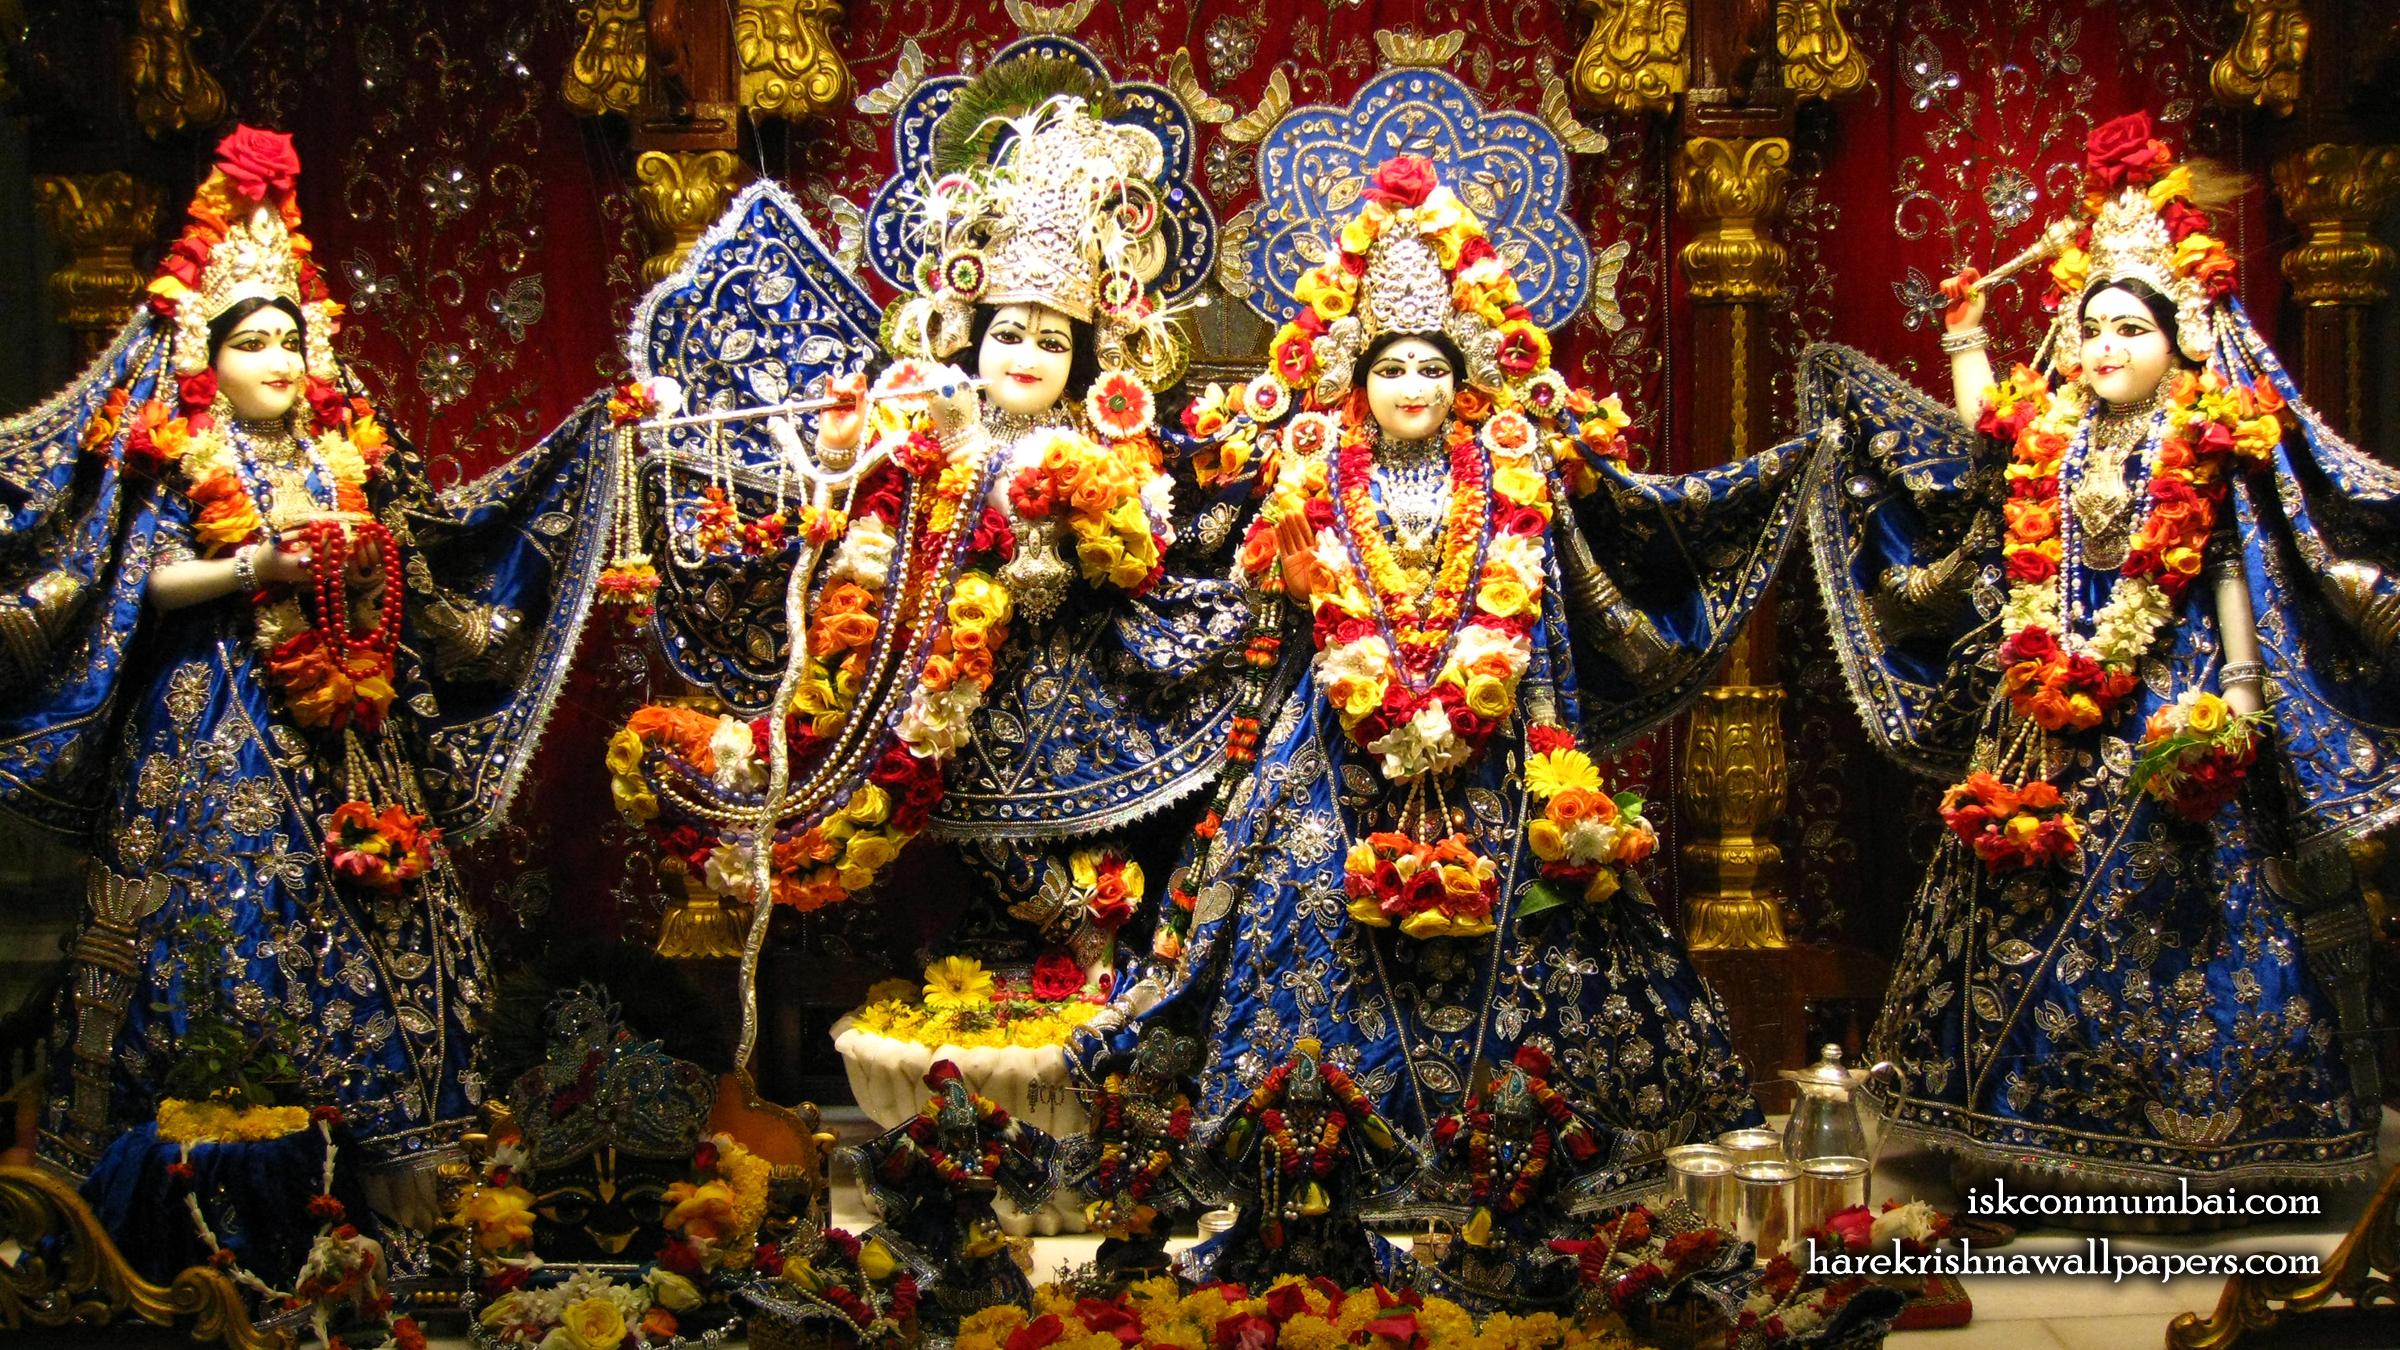 Sri Sri Radha Rasabihari Lalita Vishakha Wallpaper (010) Size 2400x1350 Download